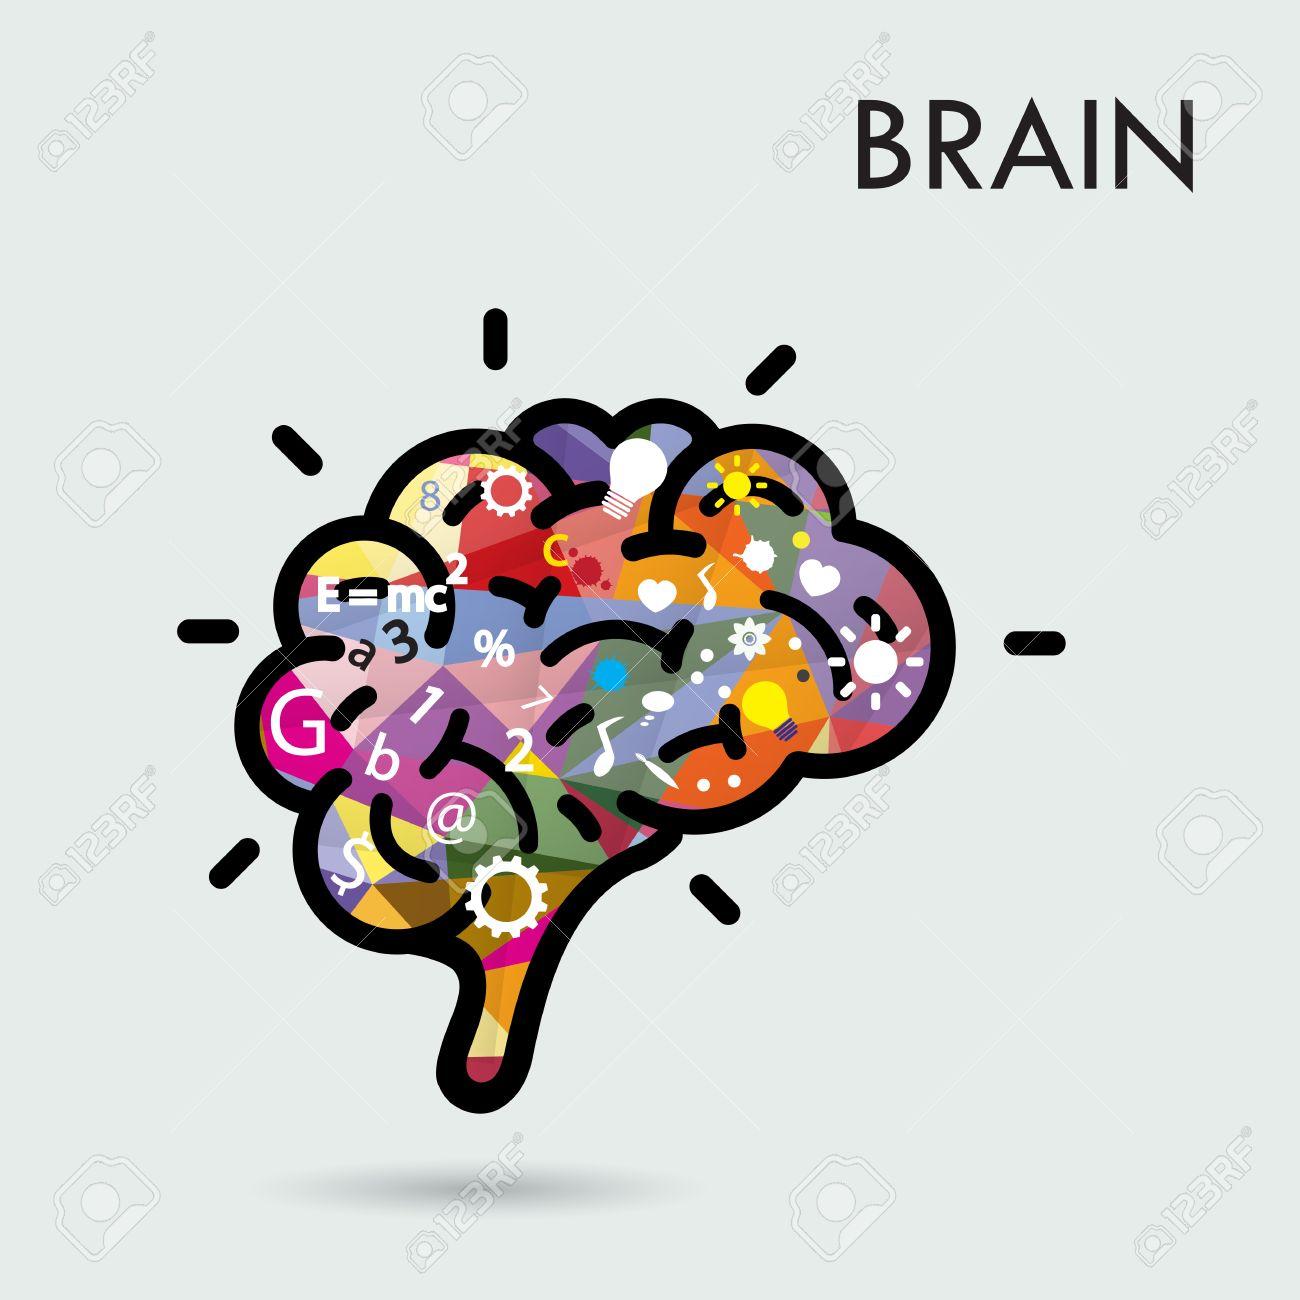 1300x1300 Creative Brain Idea Concept, Design For Poster Flyer Cover